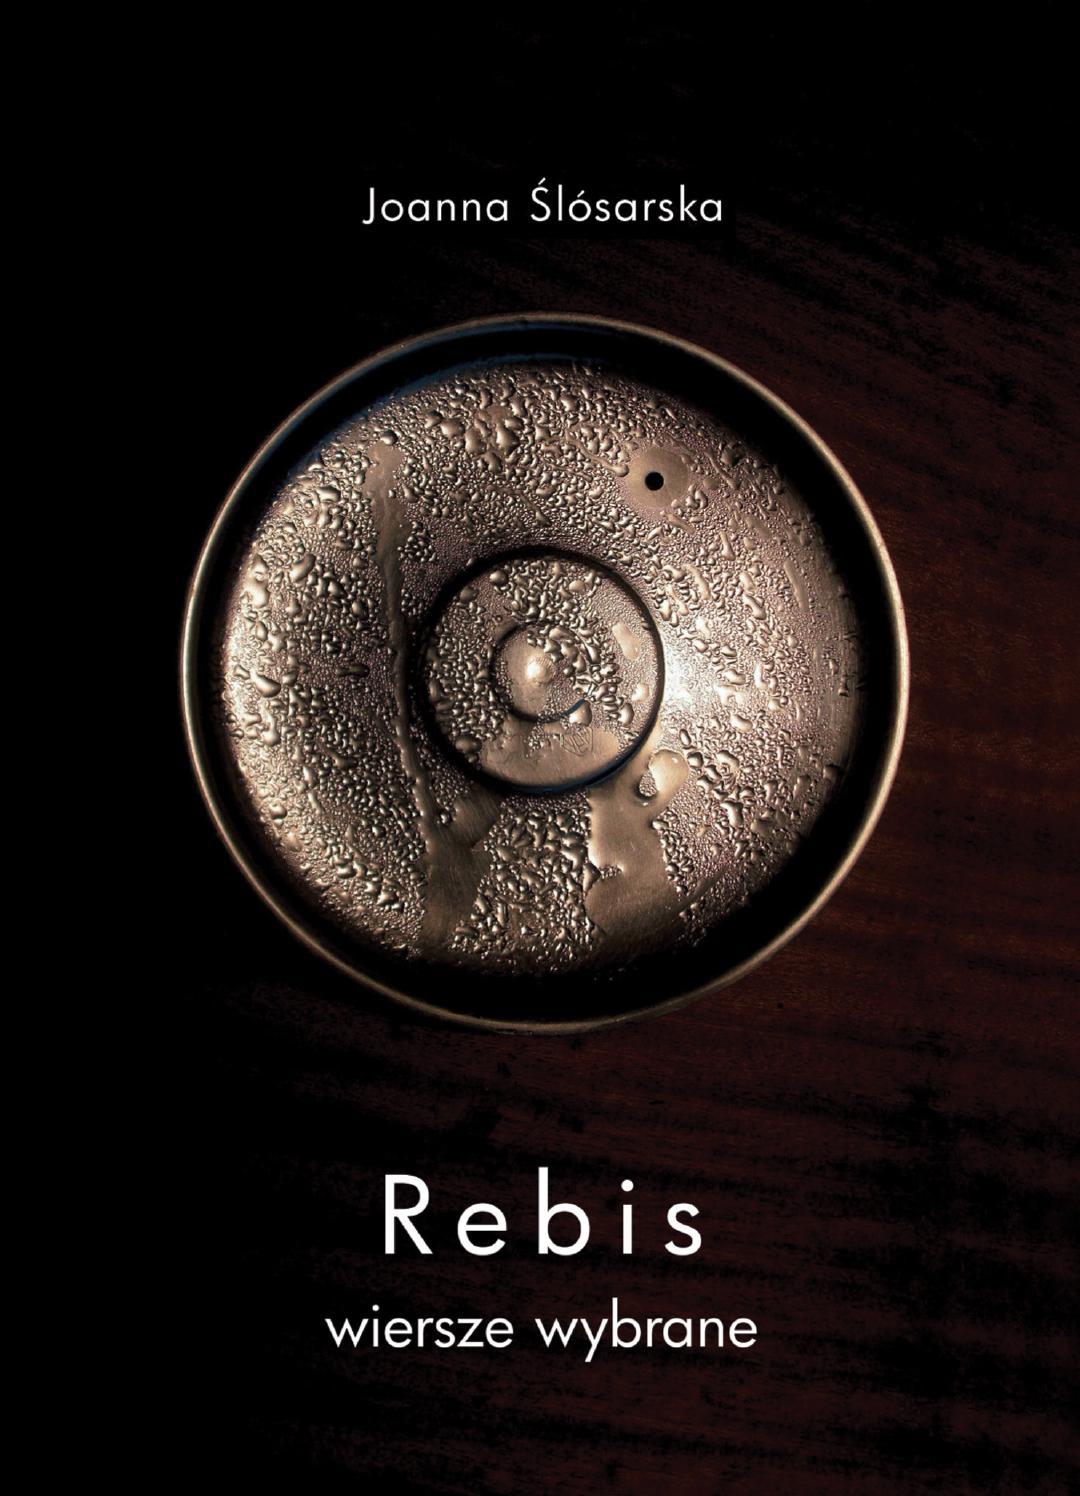 Joanna ślósarska Rebis Wiersze Wybrane By Primum Verbum